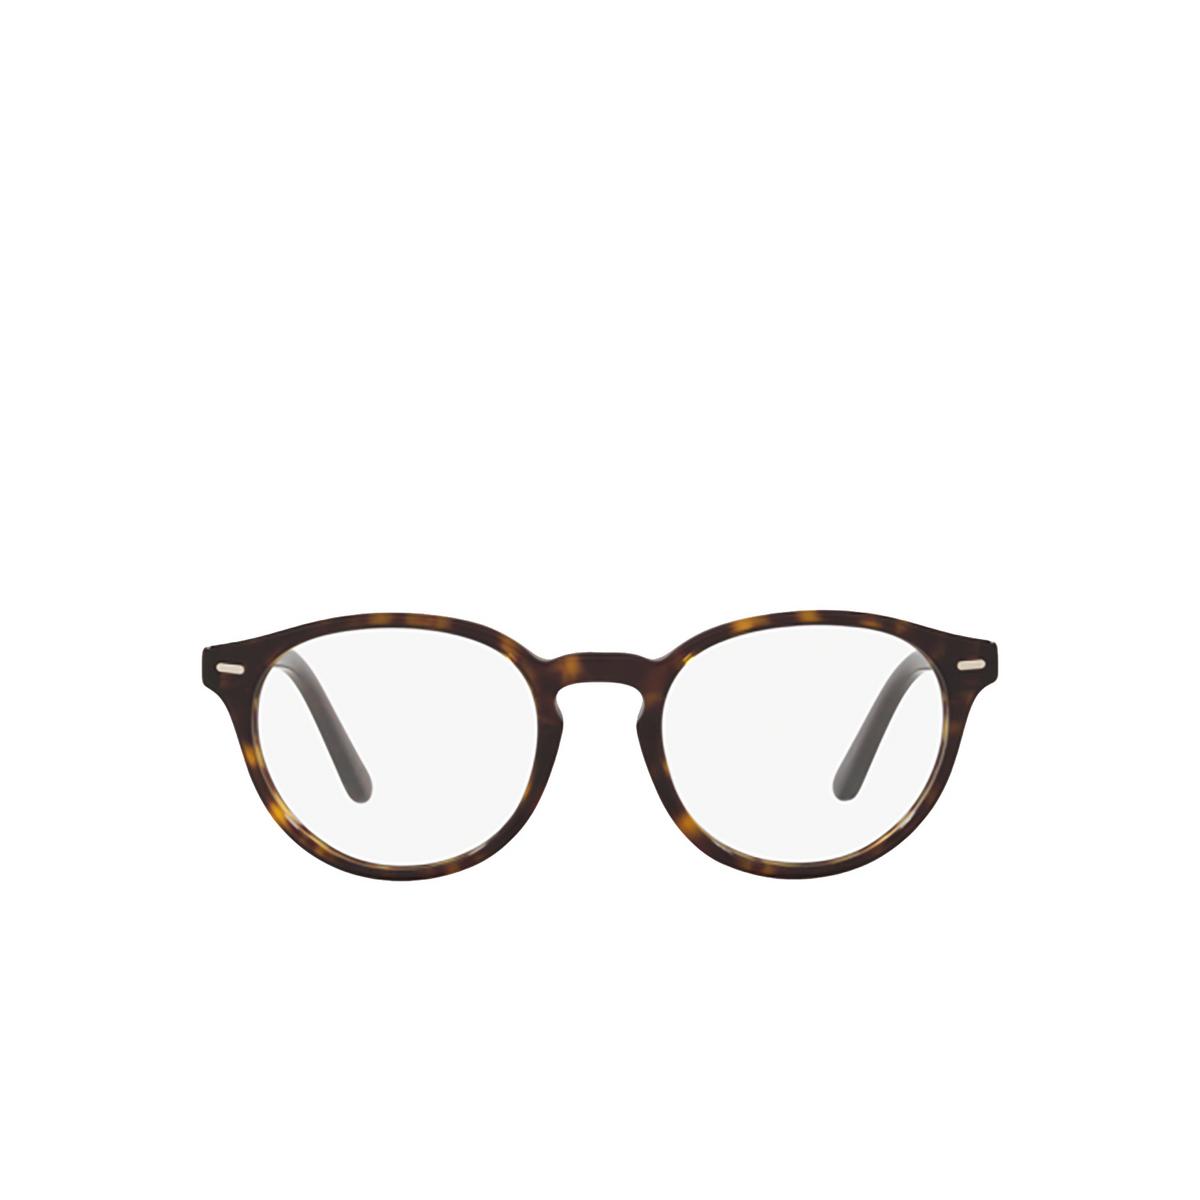 Polo Ralph Lauren® Round Eyeglasses: PH2208 color Shiny Dark Havana 5003 - front view.